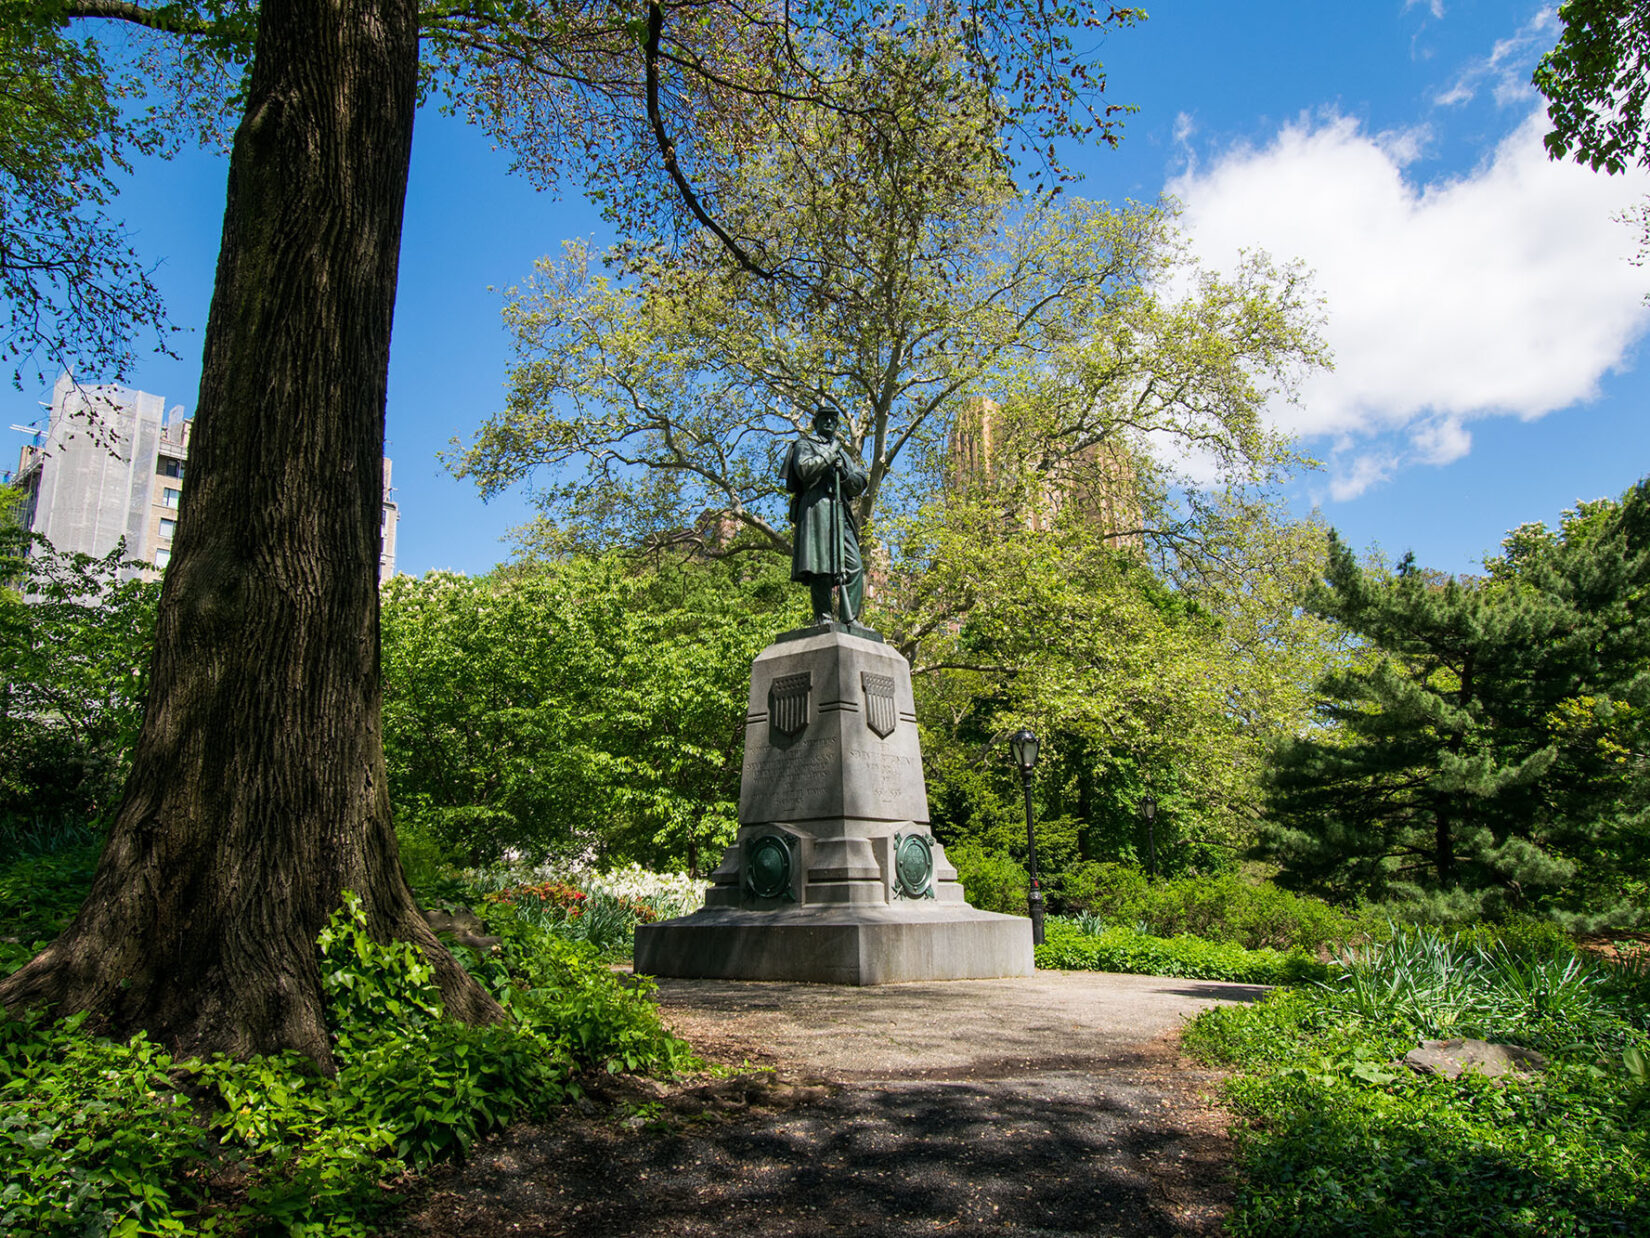 Honoring Veterans in Central Park